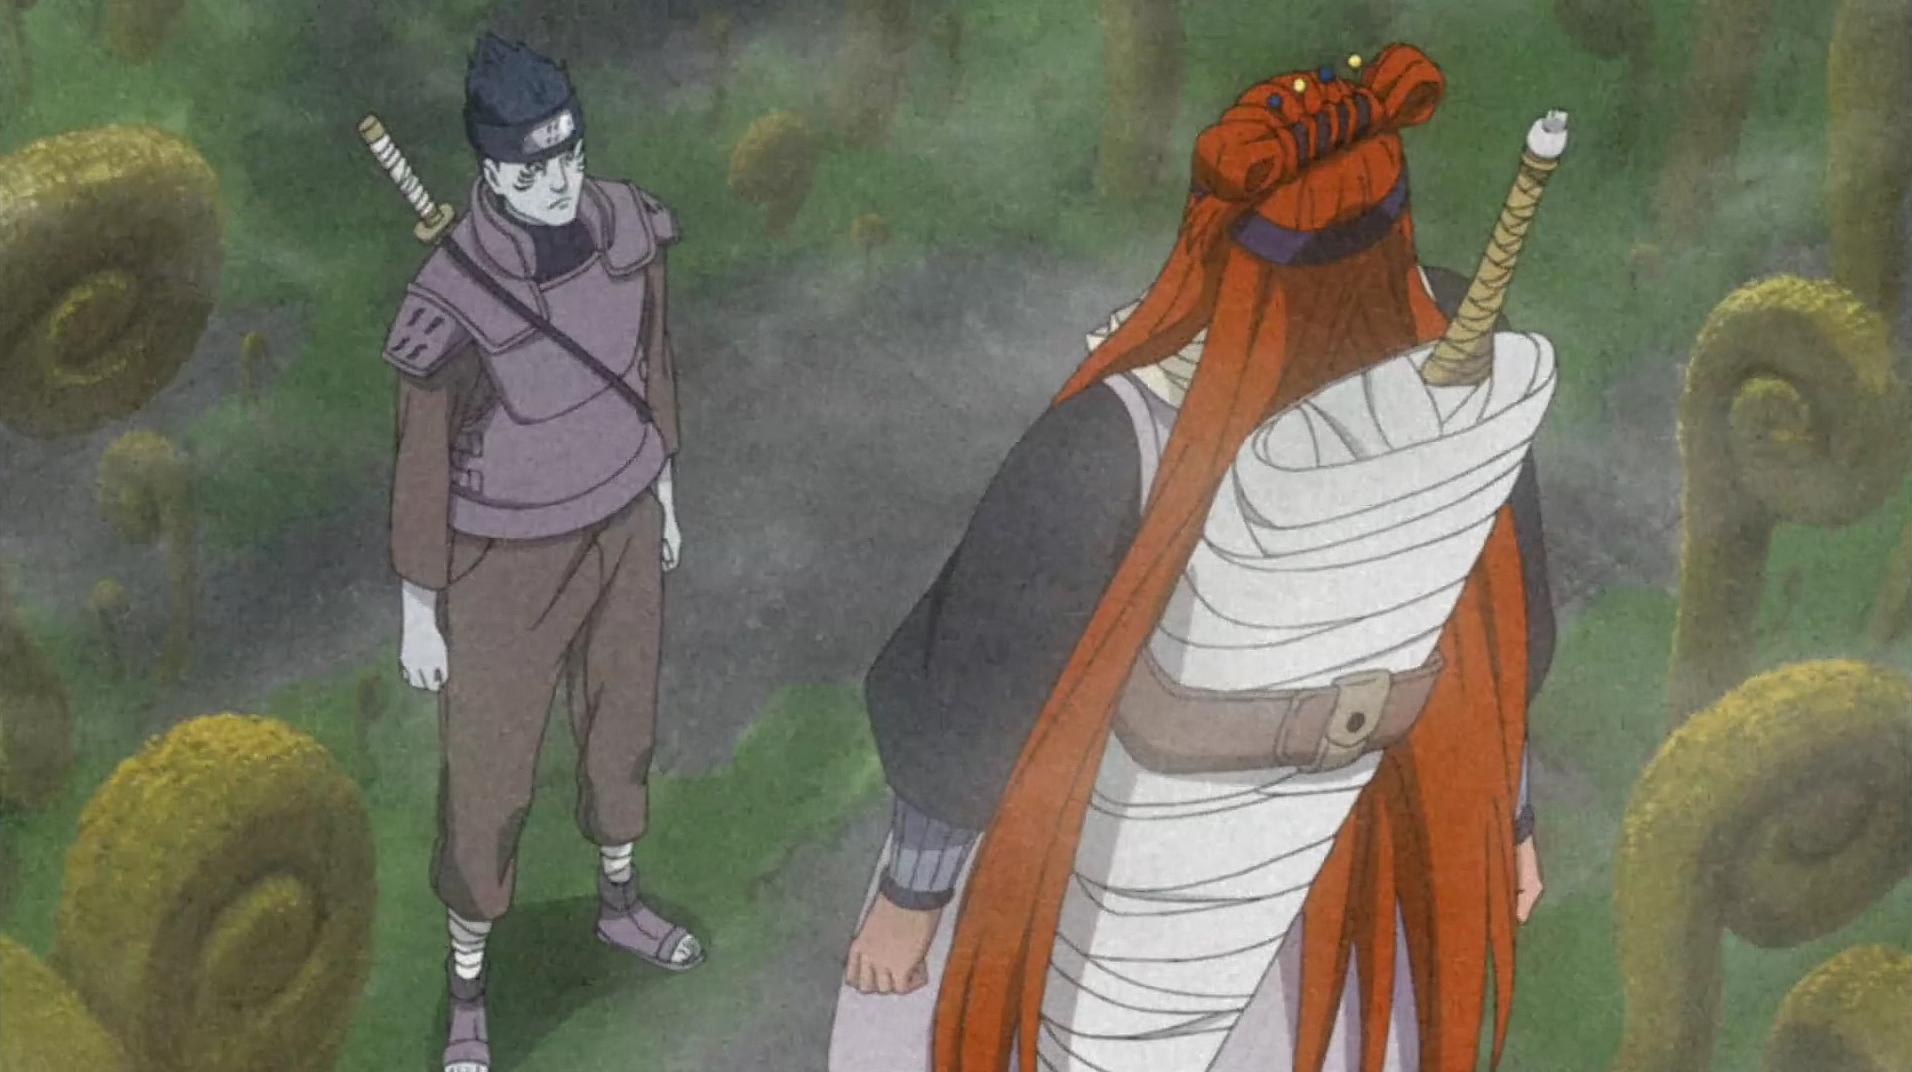 Kisame Hoshigaki | Narutopedia | FANDOM powered by Wikia